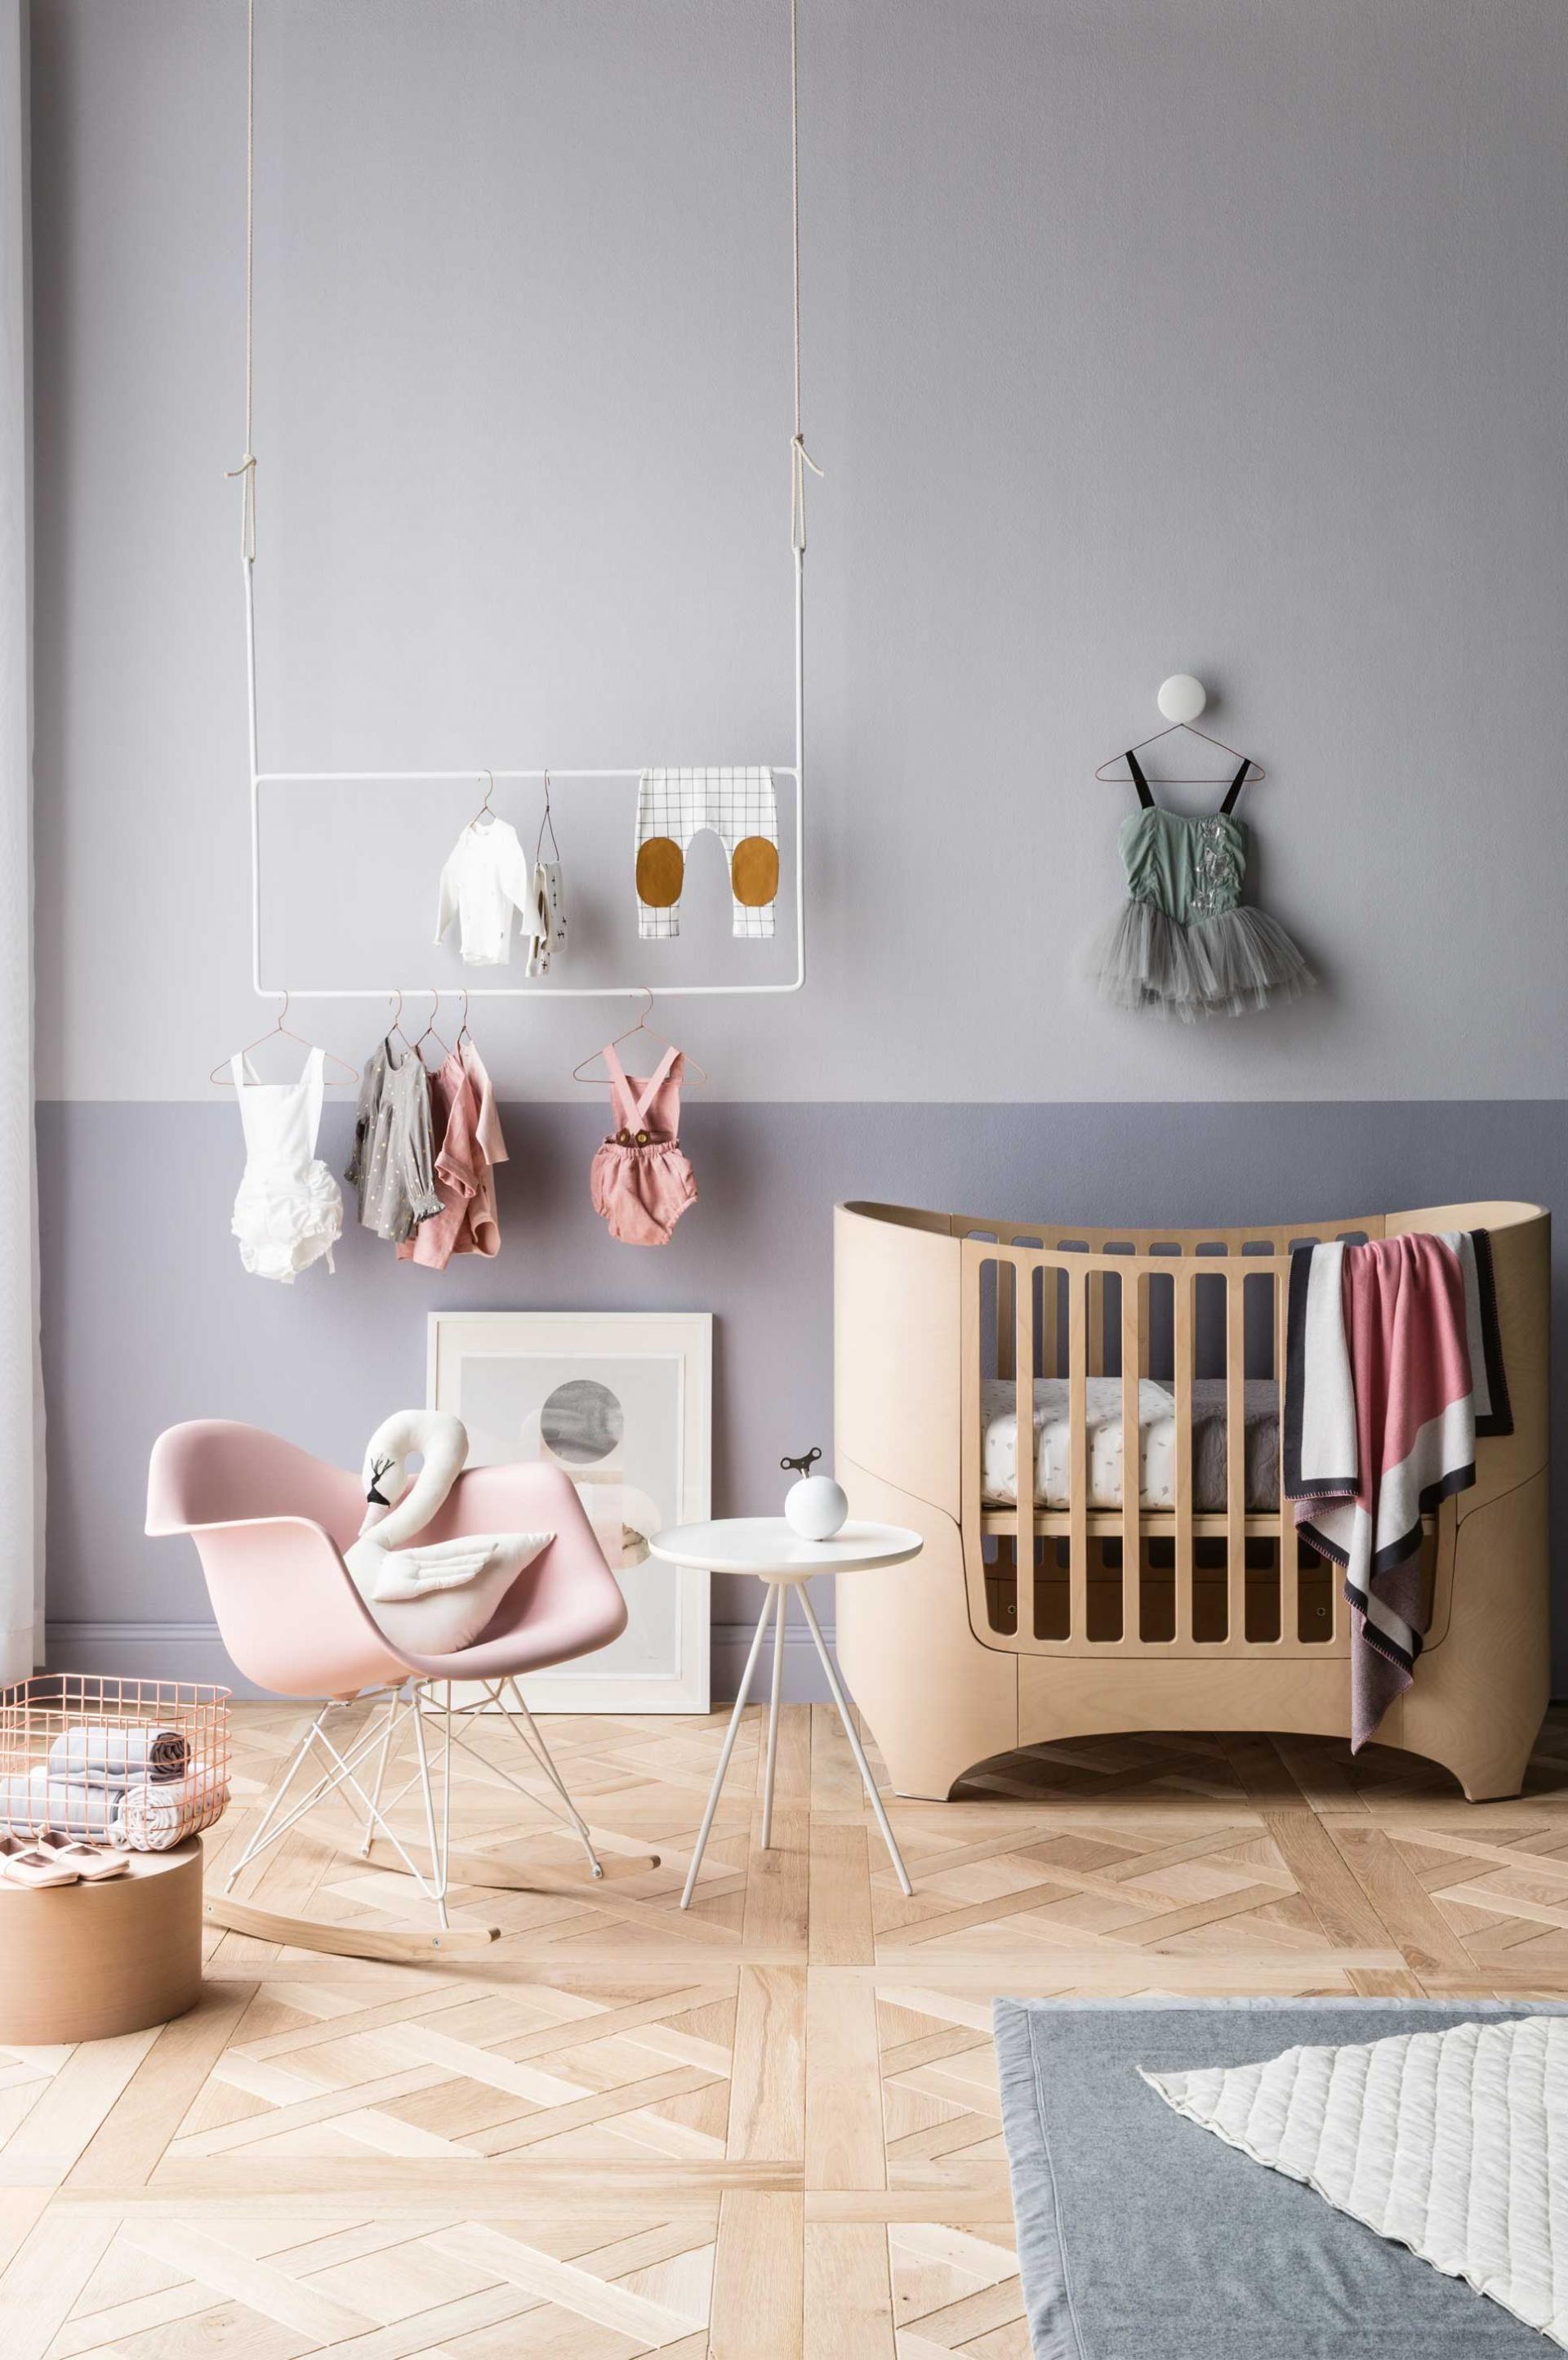 Modern baby nursery girl great selection of modern furniture with a baby accessories nursery baby room babyroom modern nursey kidsroom kids lifestyle